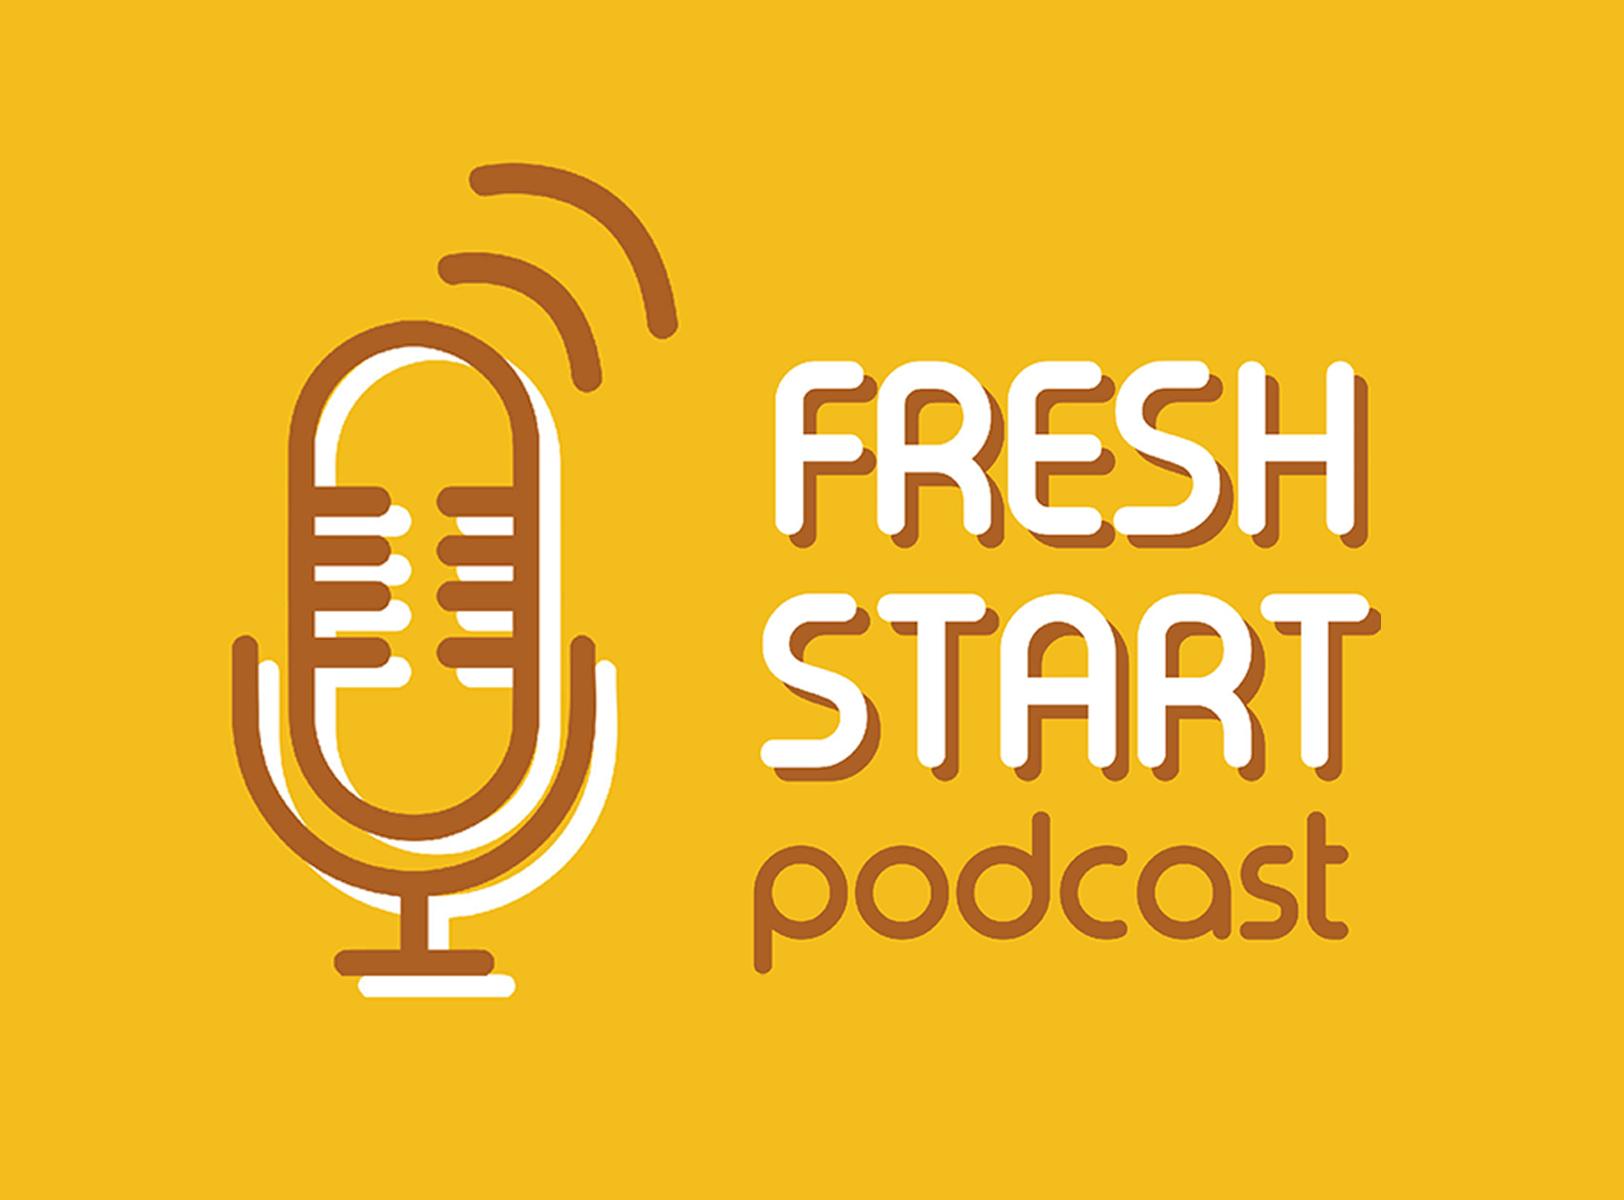 Fresh Start: Podcast News (5/8/2019 Wed.)